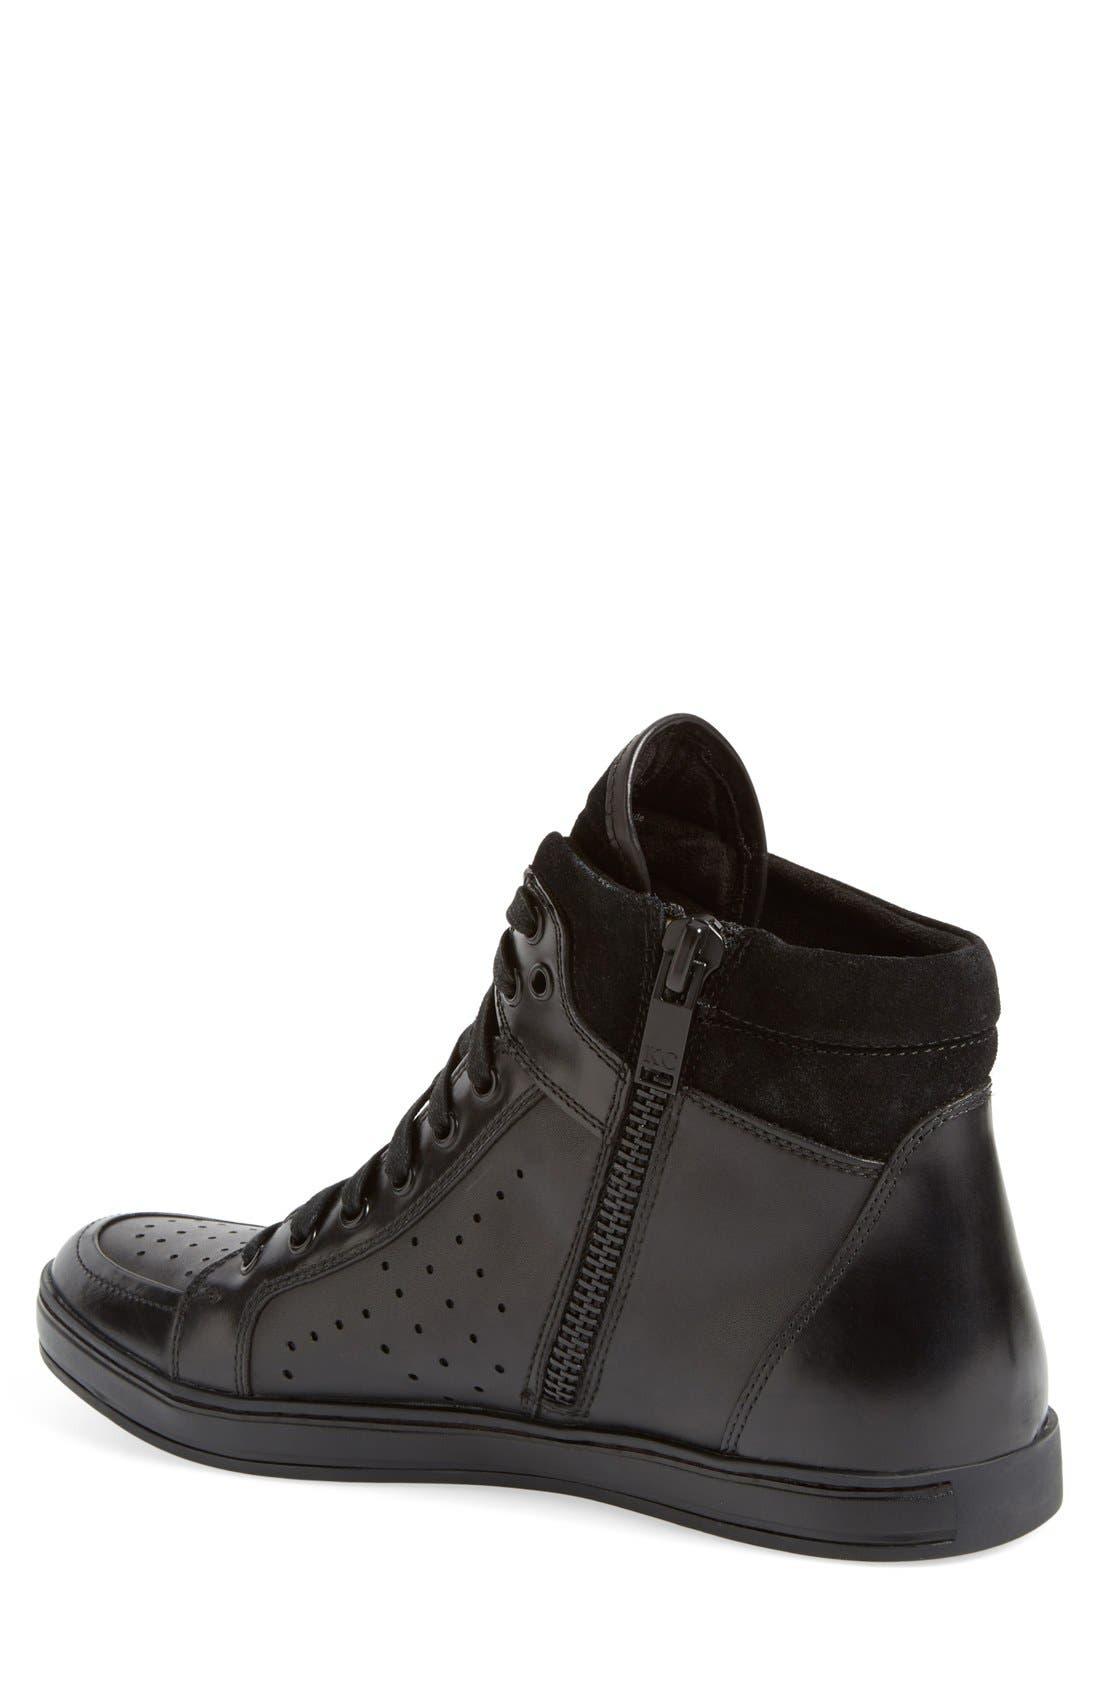 Alternate Image 2  - Kenneth Cole New York 'Big Brand' Sneaker (Men)